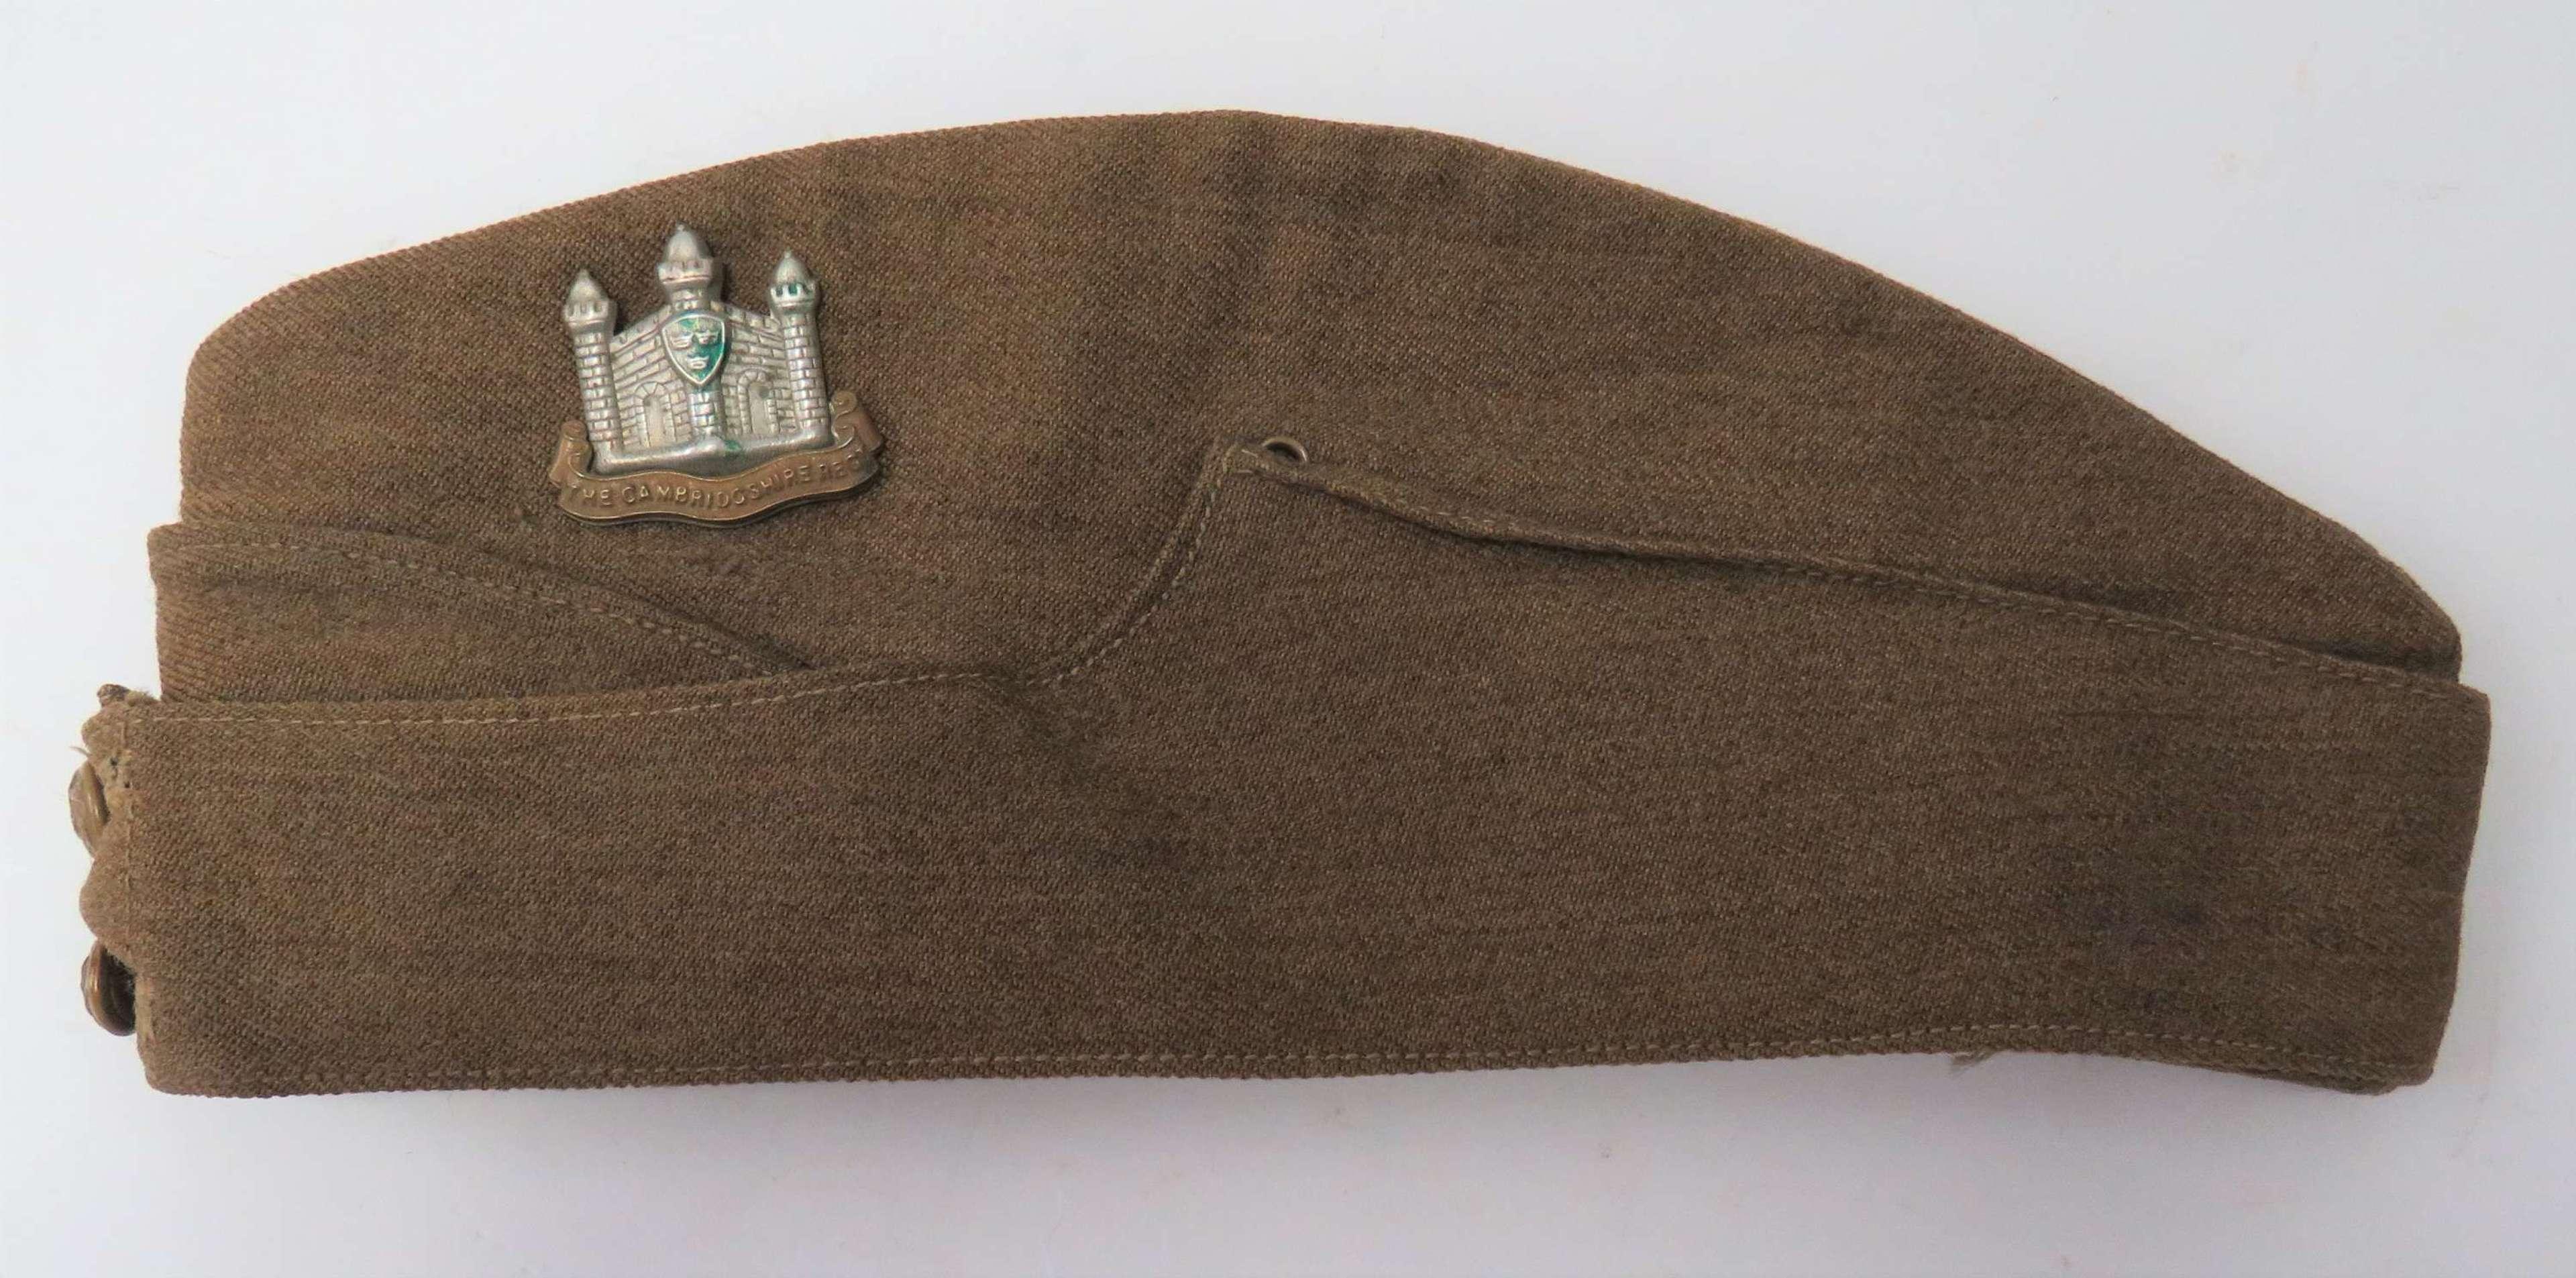 1939 Dated Cambridgeshire Regiment Other Ranks Field Service Cap